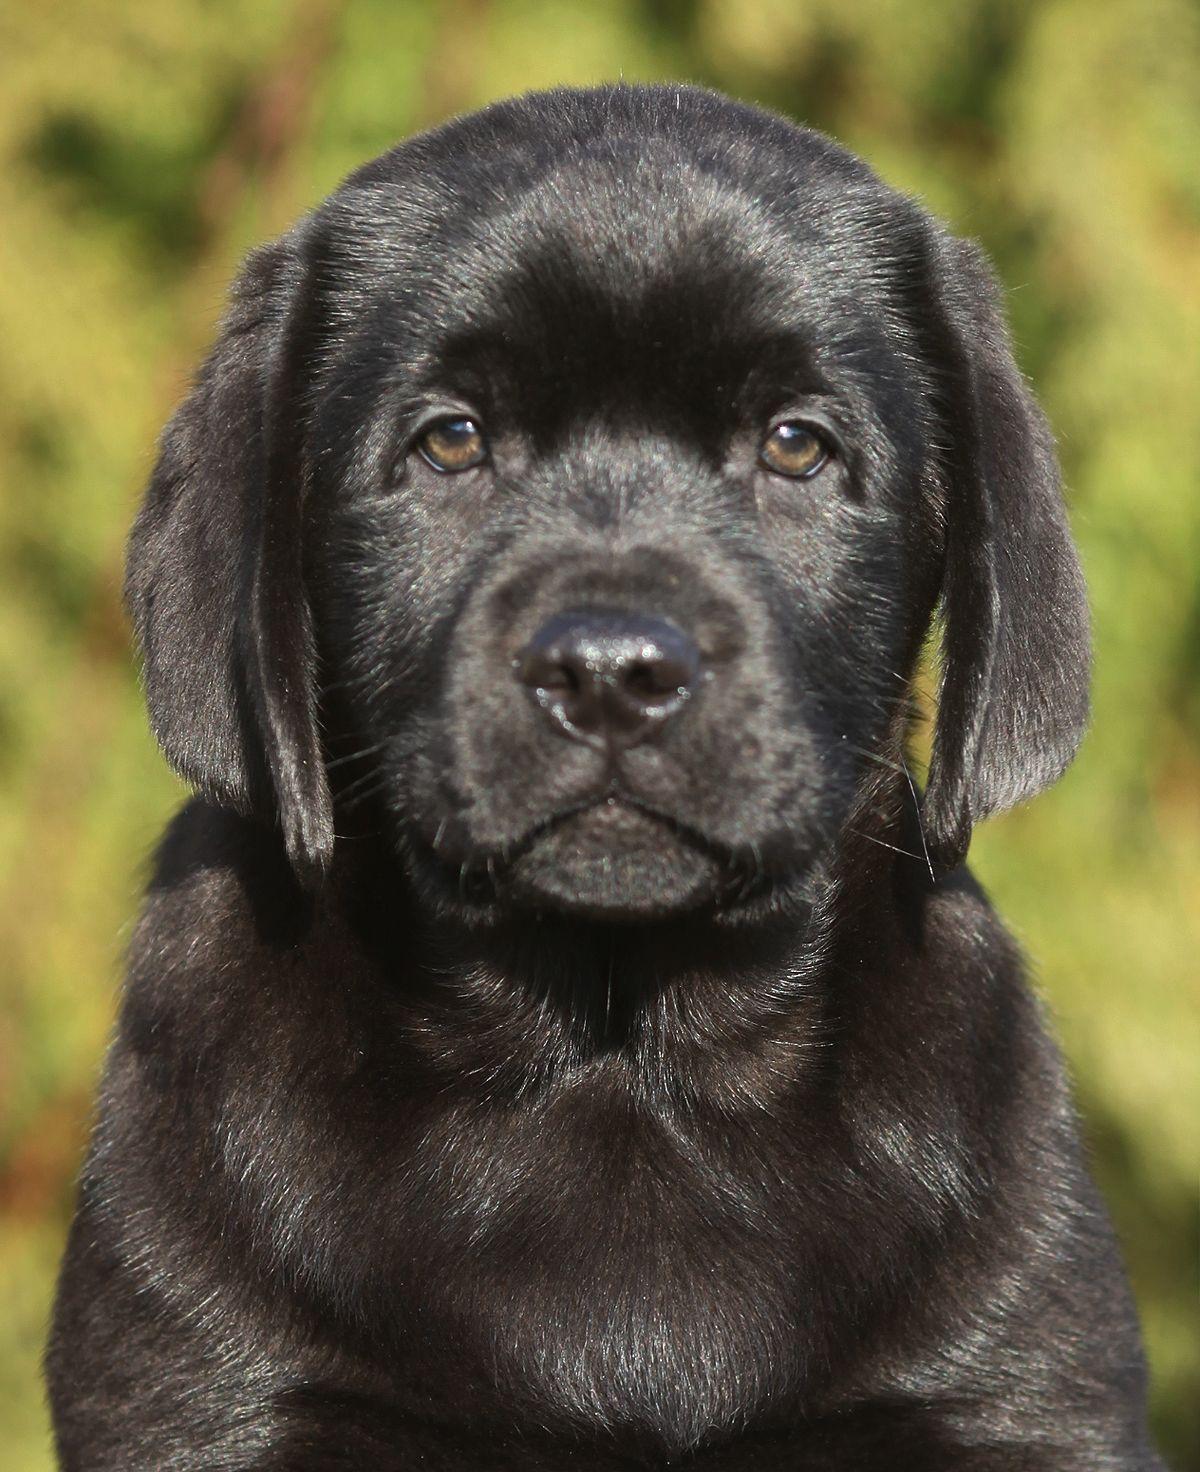 Neo The Labrador Retriever Boy Is The Most Wonderful Puppy Who We Ever Meet Labrador Retriever Black Labrador Retriever Black Labrador Puppy